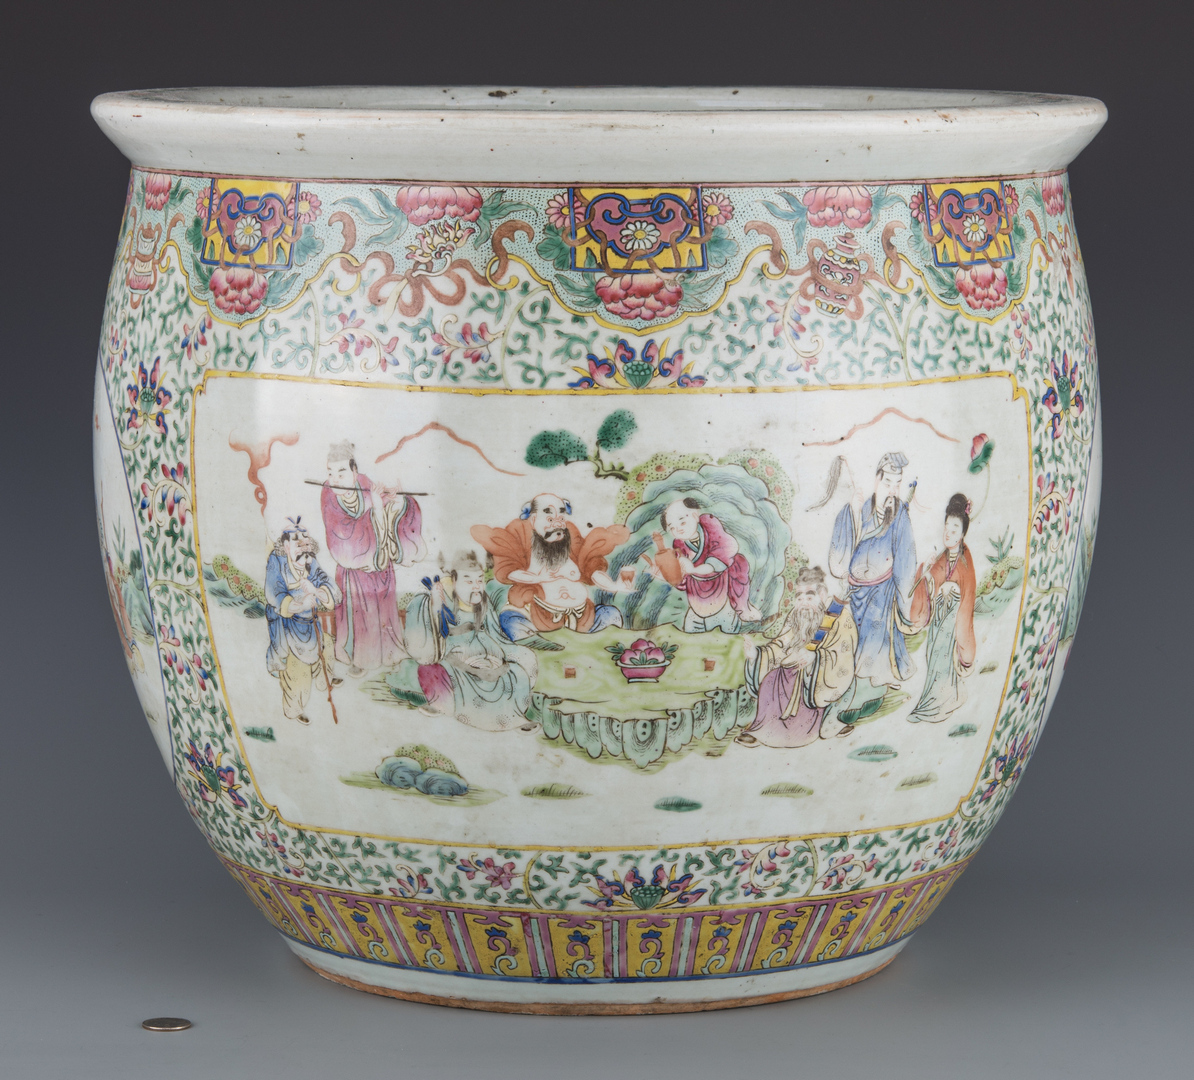 Lot 22 Famille Rose Porcelain Fish Bowl Republic Period